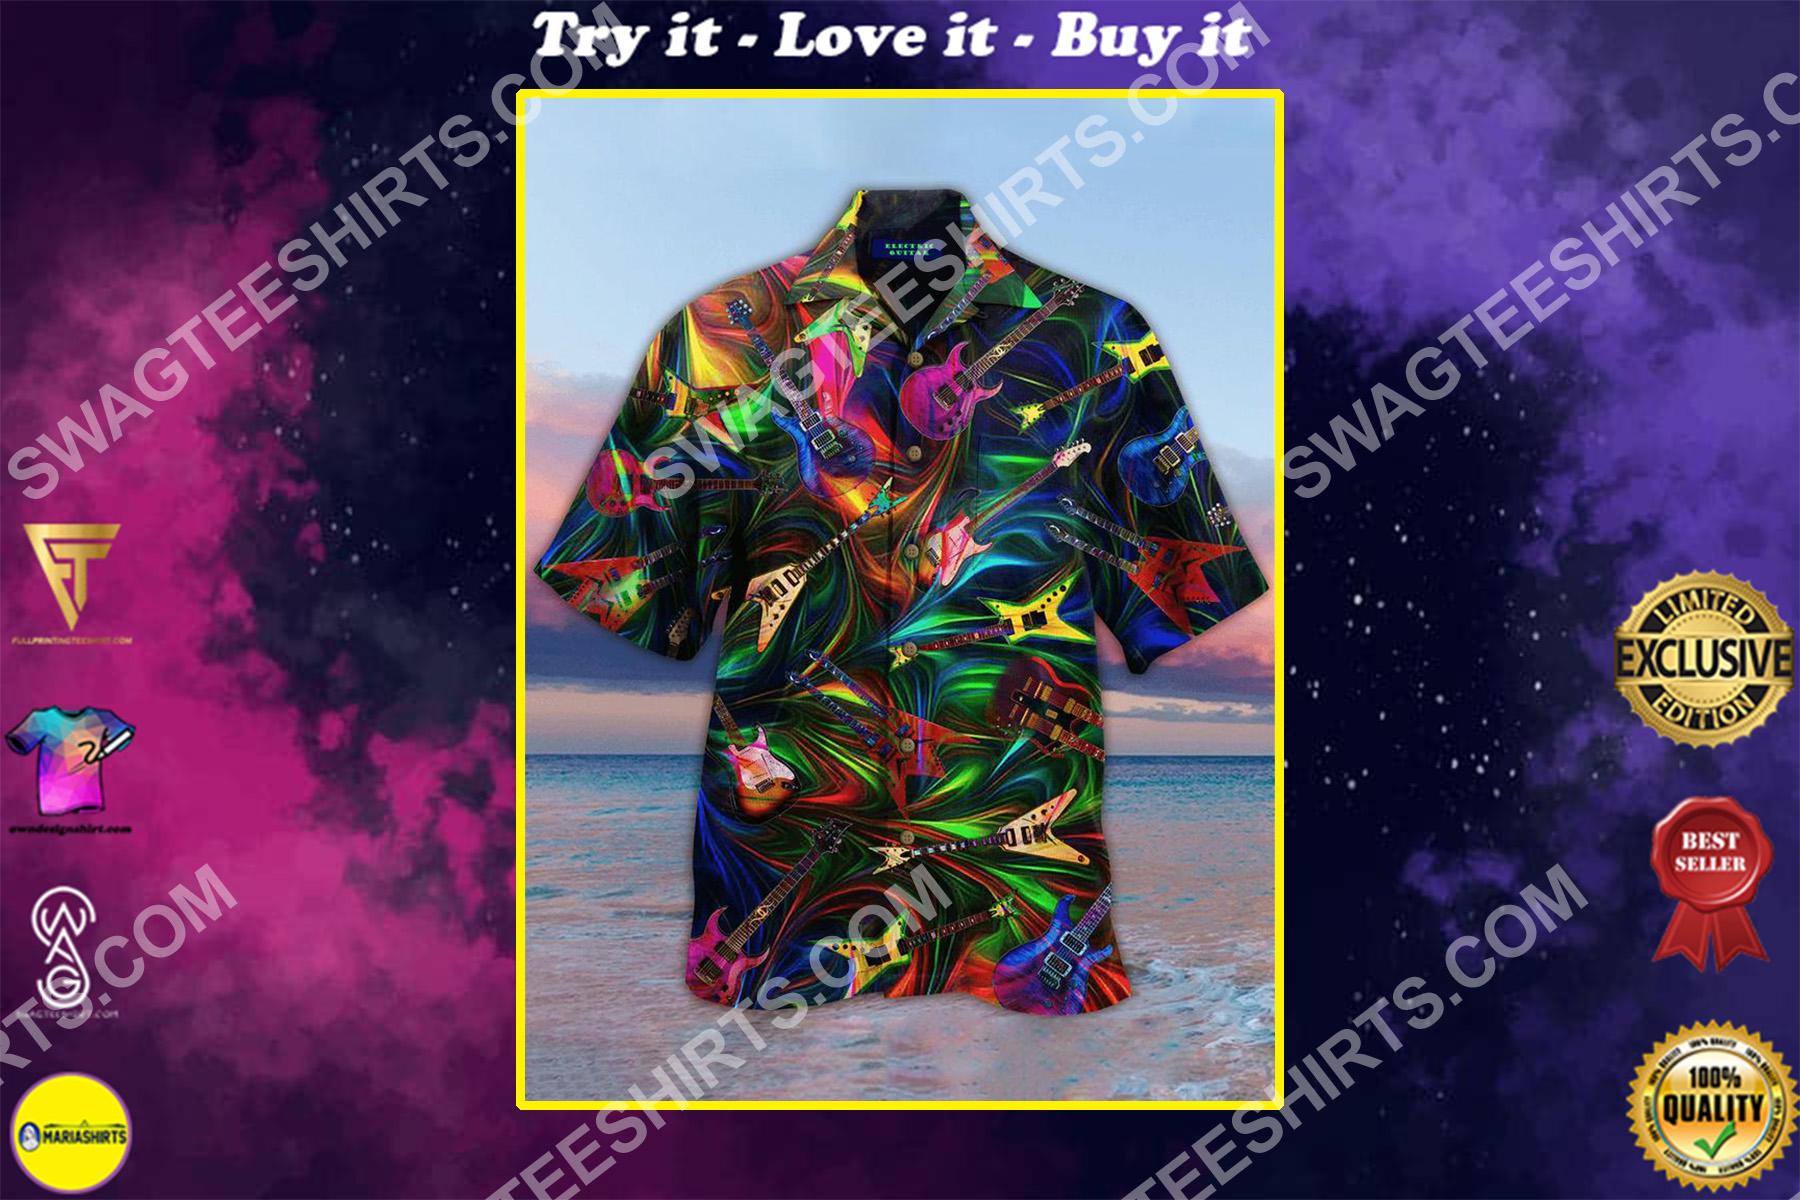 the guitar colorful all over printed hawaiian shirt